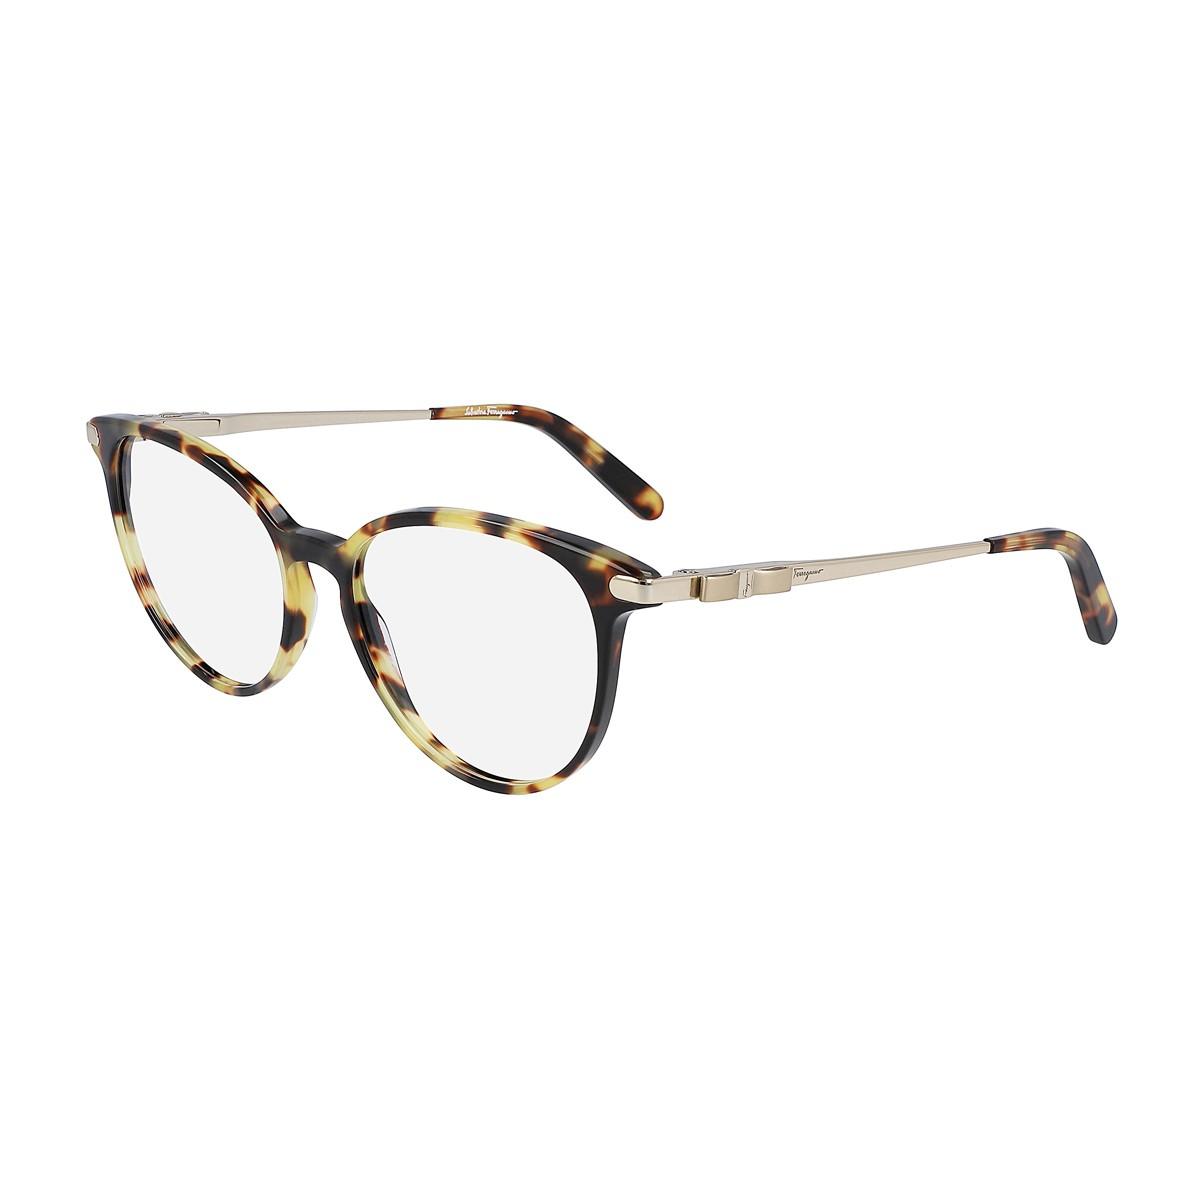 Salvatore Ferragamo SF2862 | Women's eyeglasses